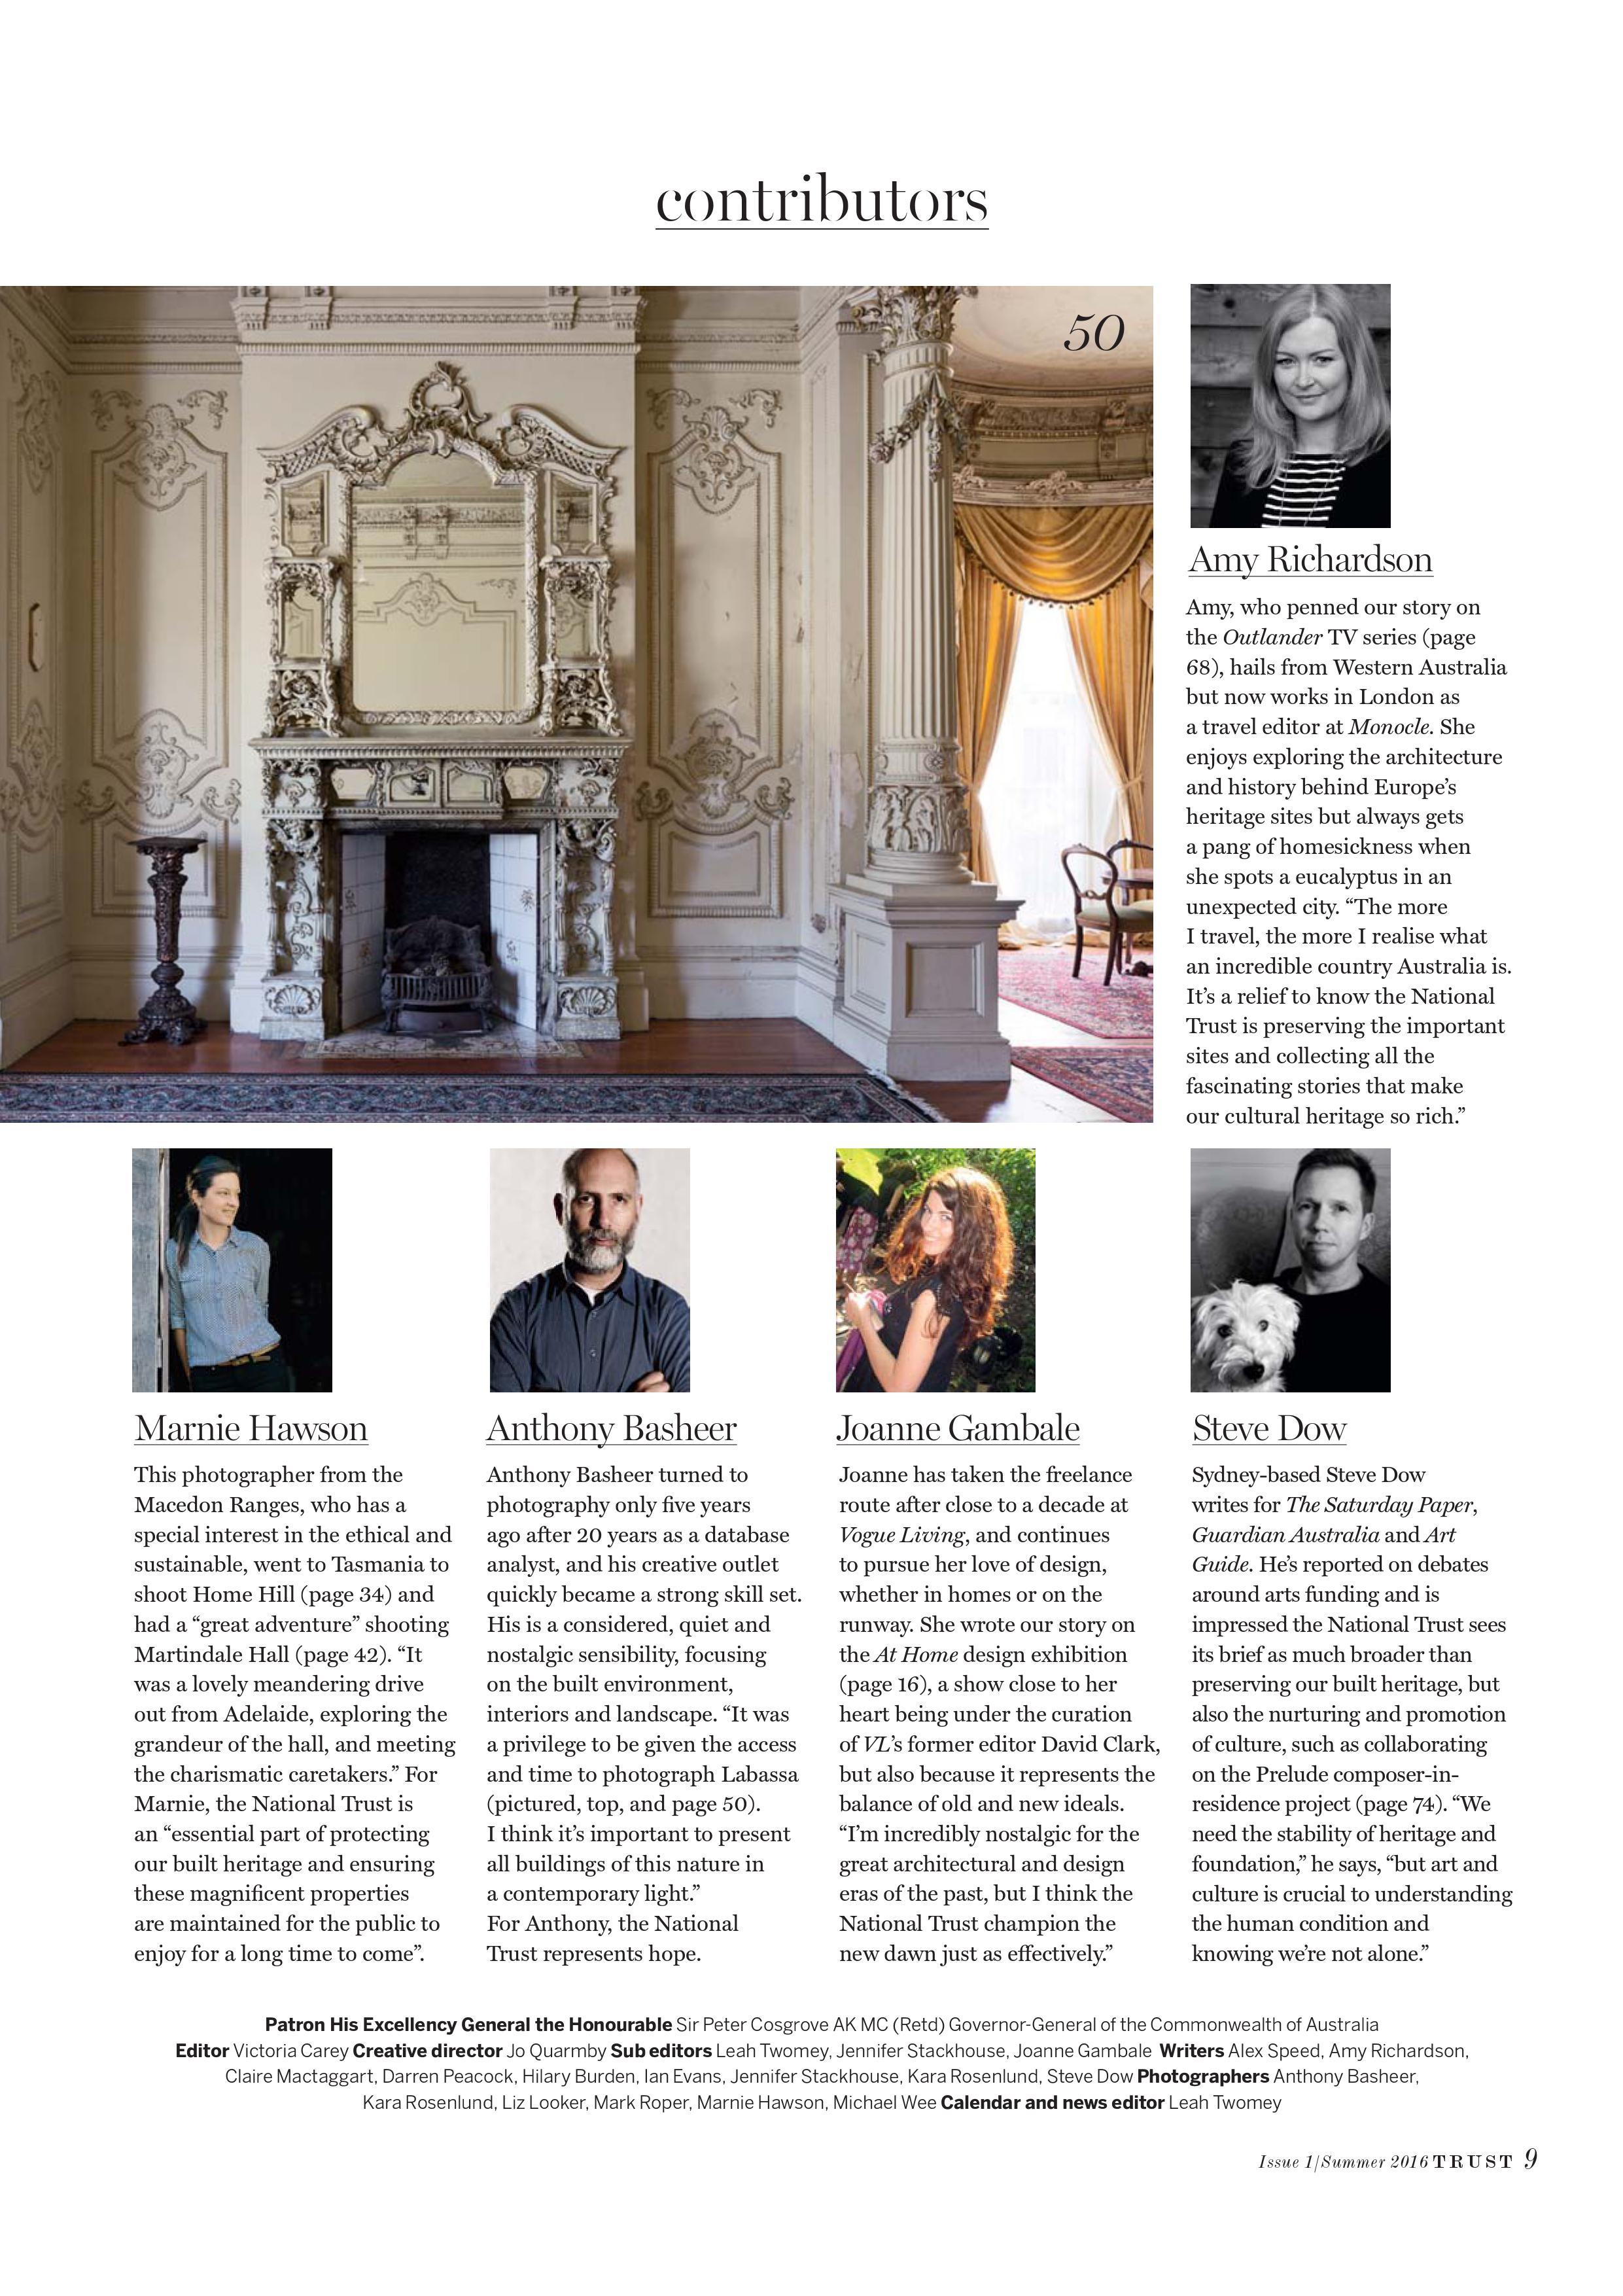 Marnie Hawson for The National Trusts of Australia magazine